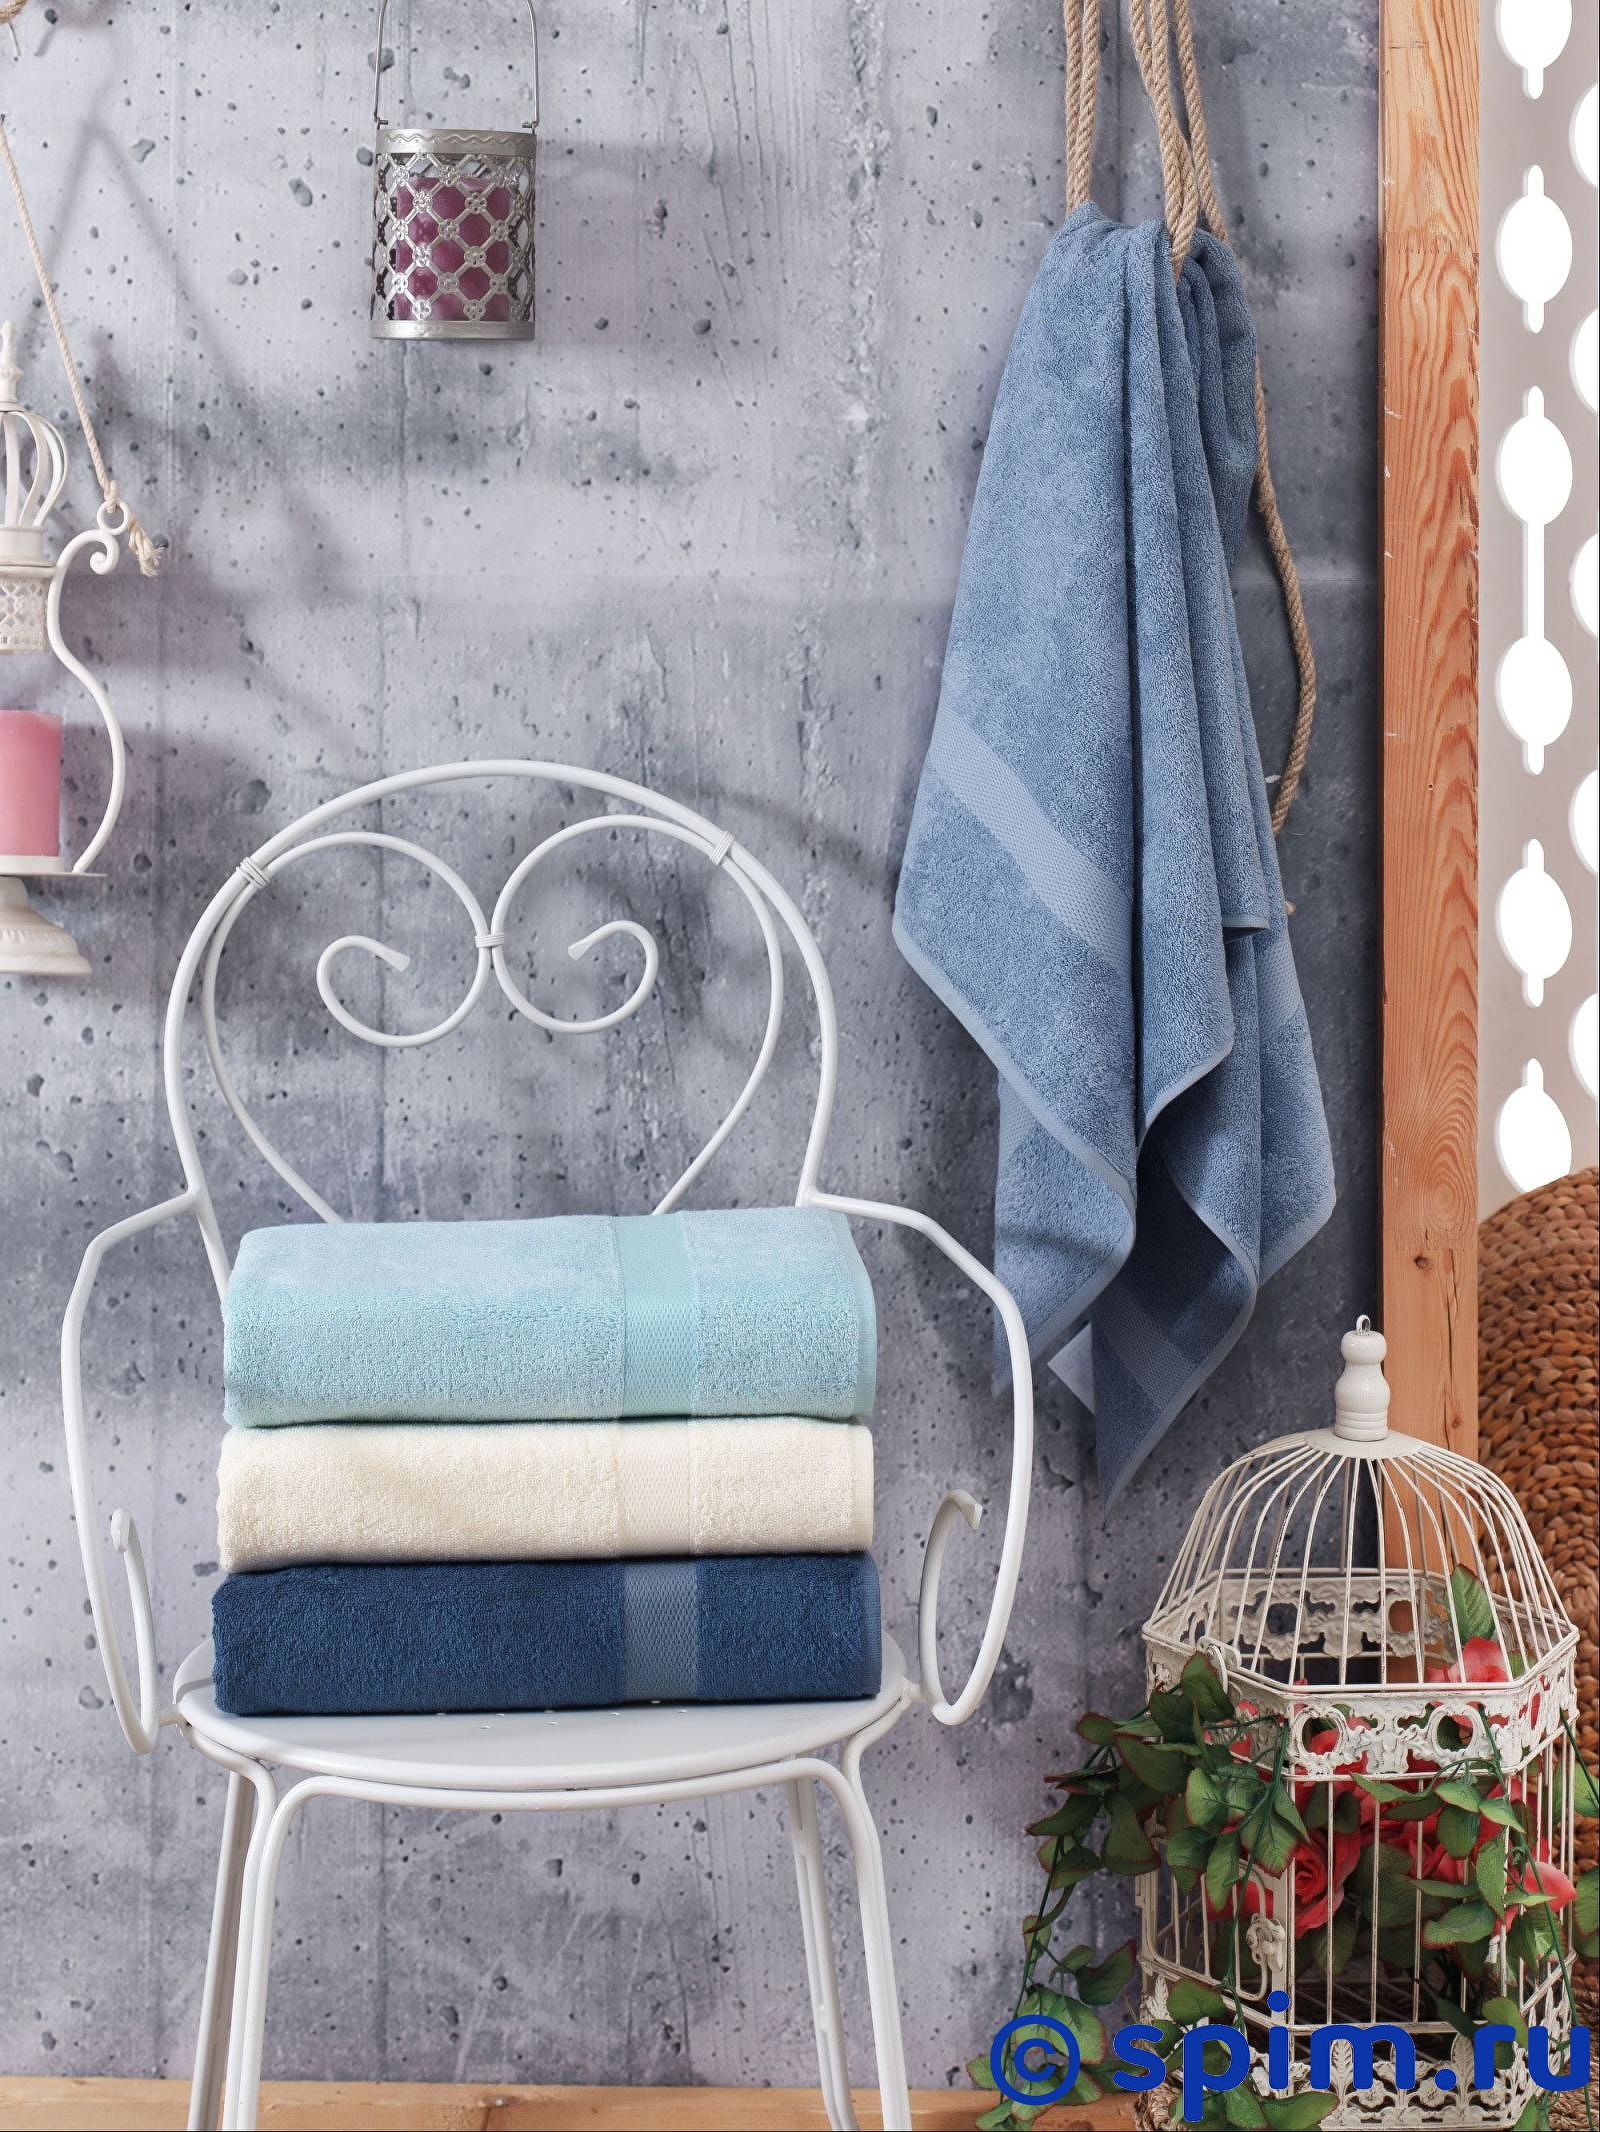 Набор из 4-х полотенец Do&co Olivi 70х140 см полотенца do n co полотенце lady цвет мятный набор